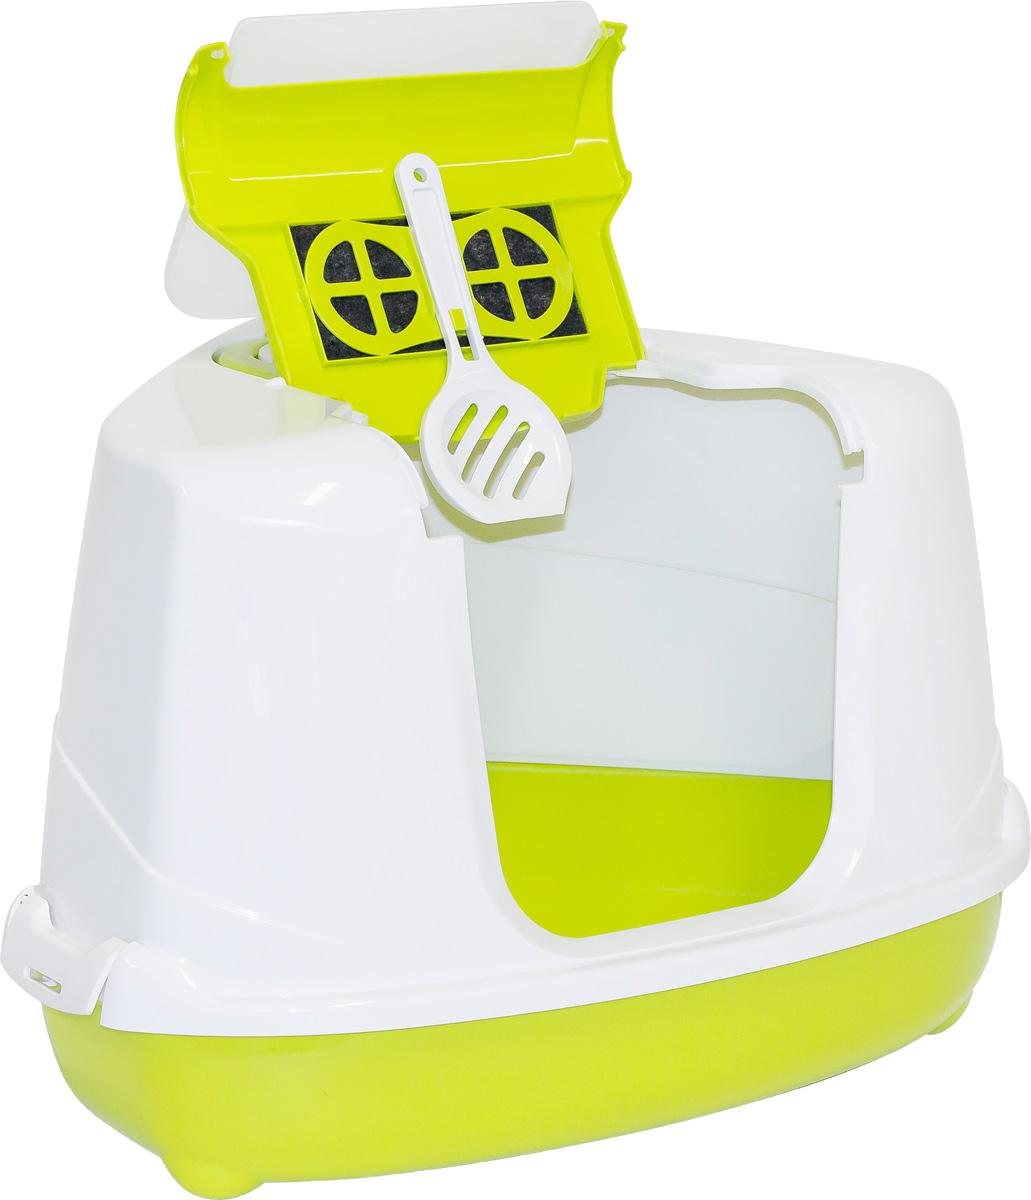 "Туалет угловой закрытый для кошек Moderna ""Flip Corner"", цвет: зеленый, 56х45х39 см"